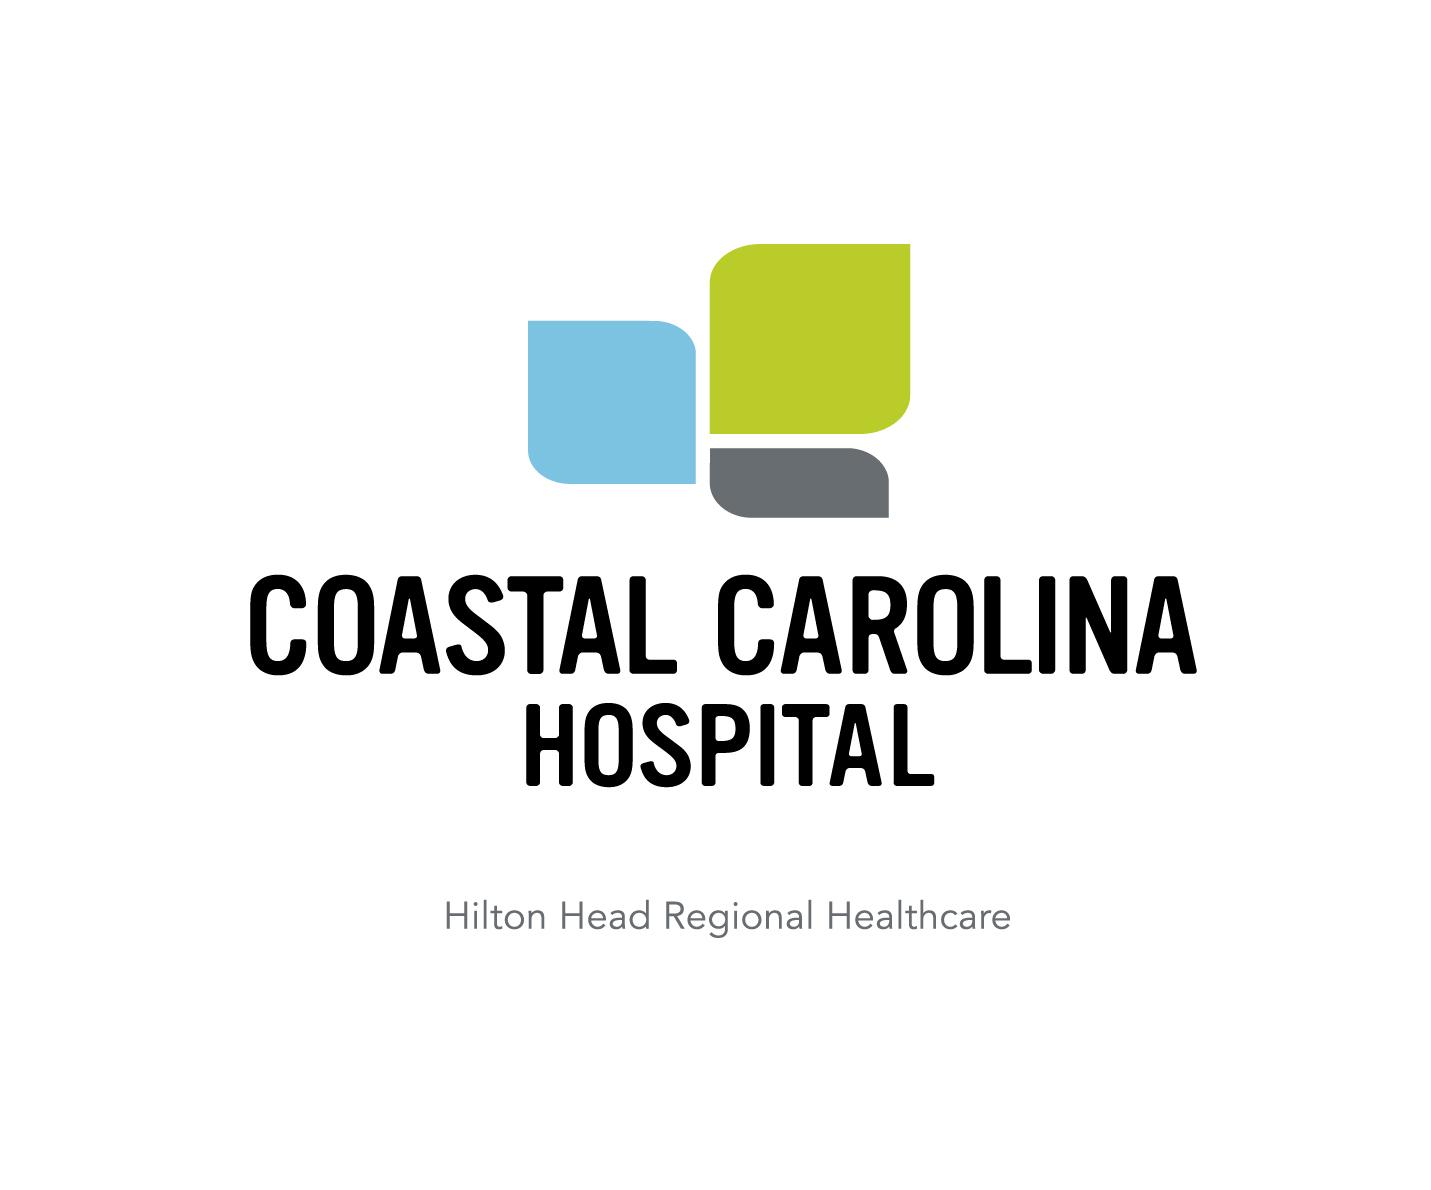 A photo of Coastal Carolina Hospital